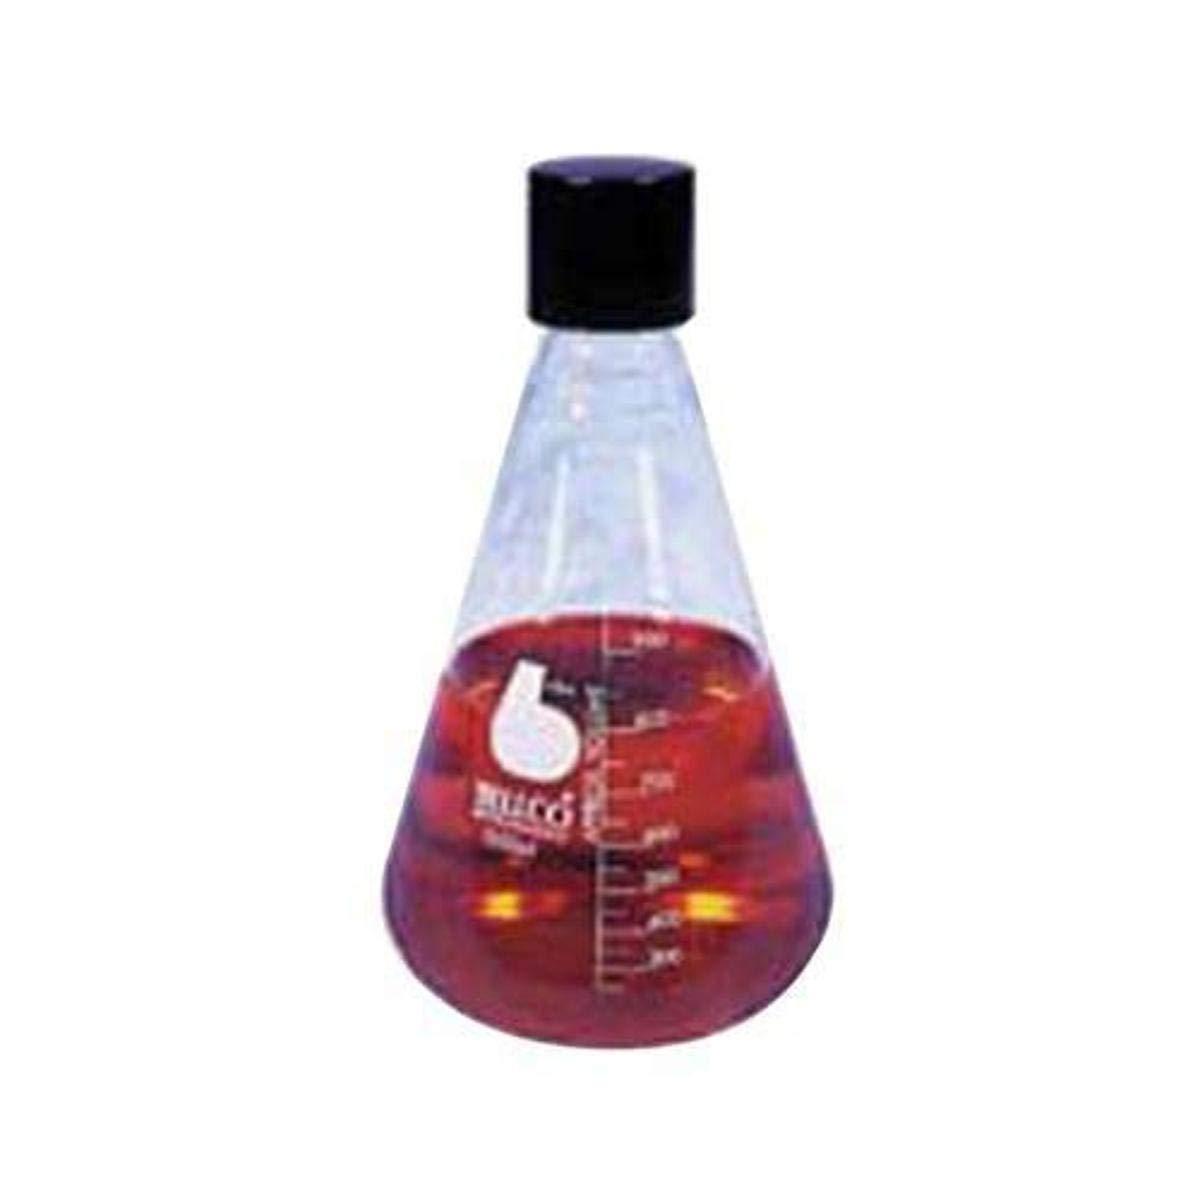 Bellco Glass 2514-00125 Borosilicate Glass Graduated Erlenmeyer Flask with Deep-Skirted Black Phenolic Screw Cap, Narrow Mouth, 125mL Capacity (Case of 12)